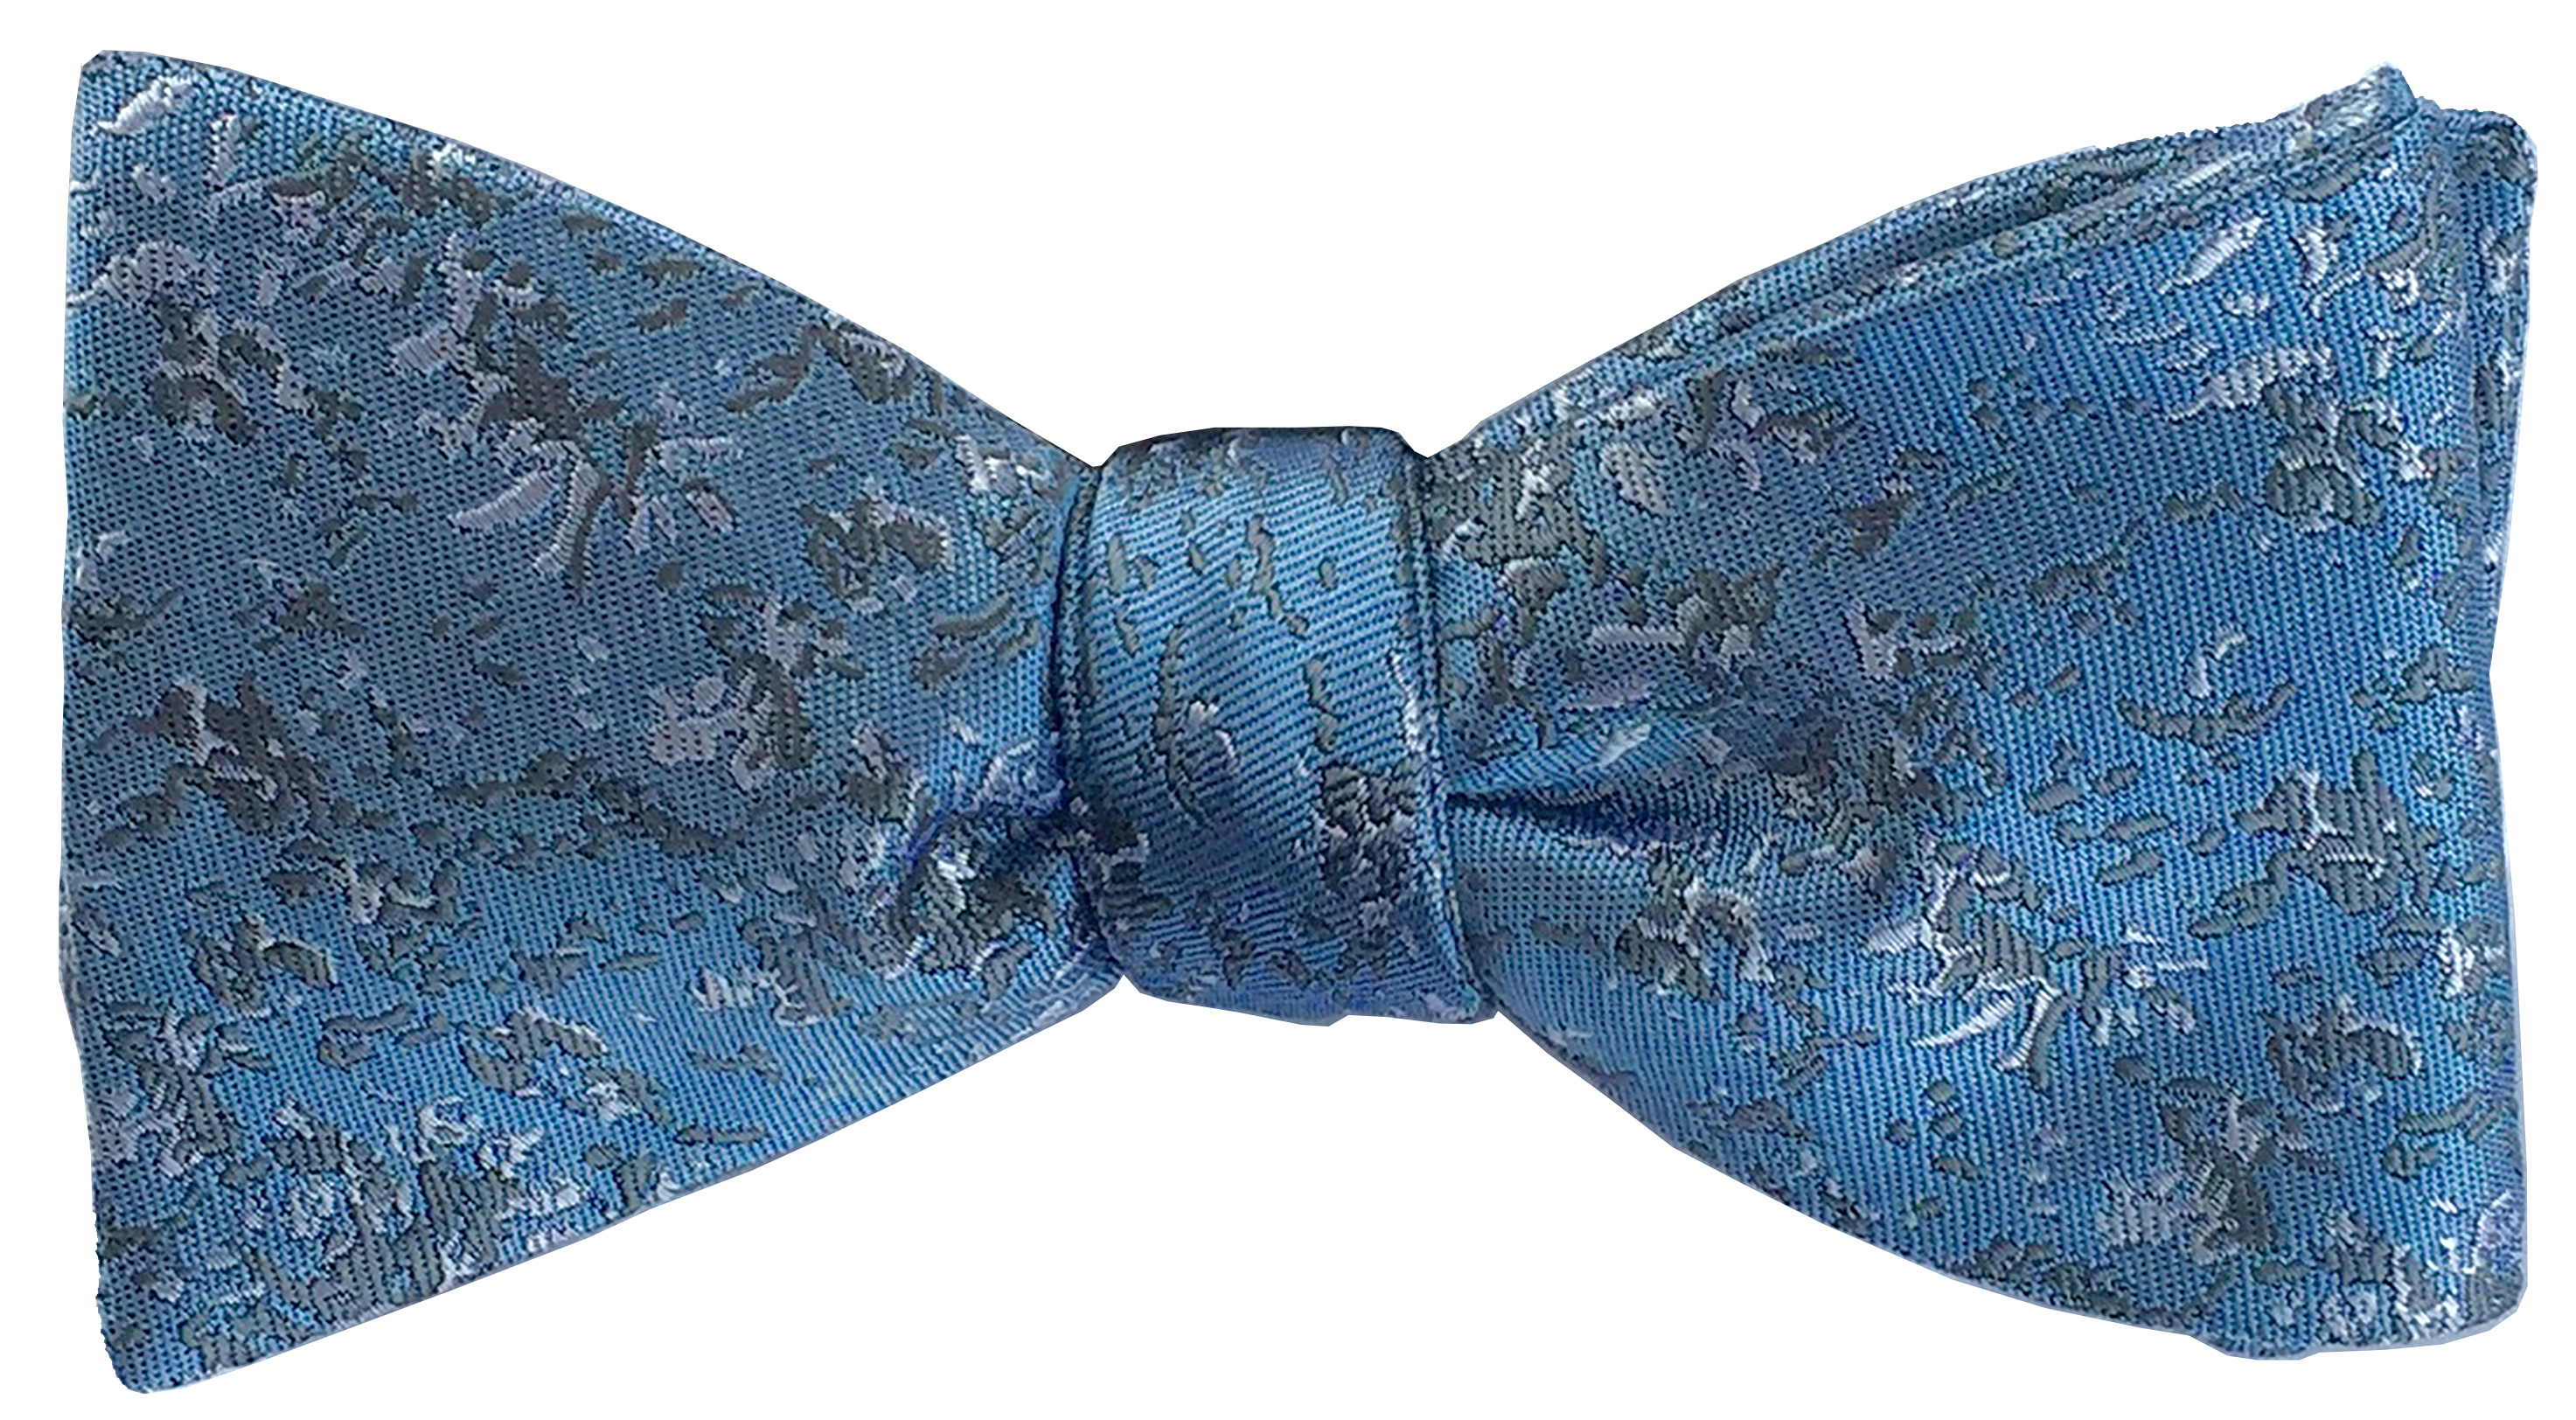 Arctic Drift bow tie in sky blue